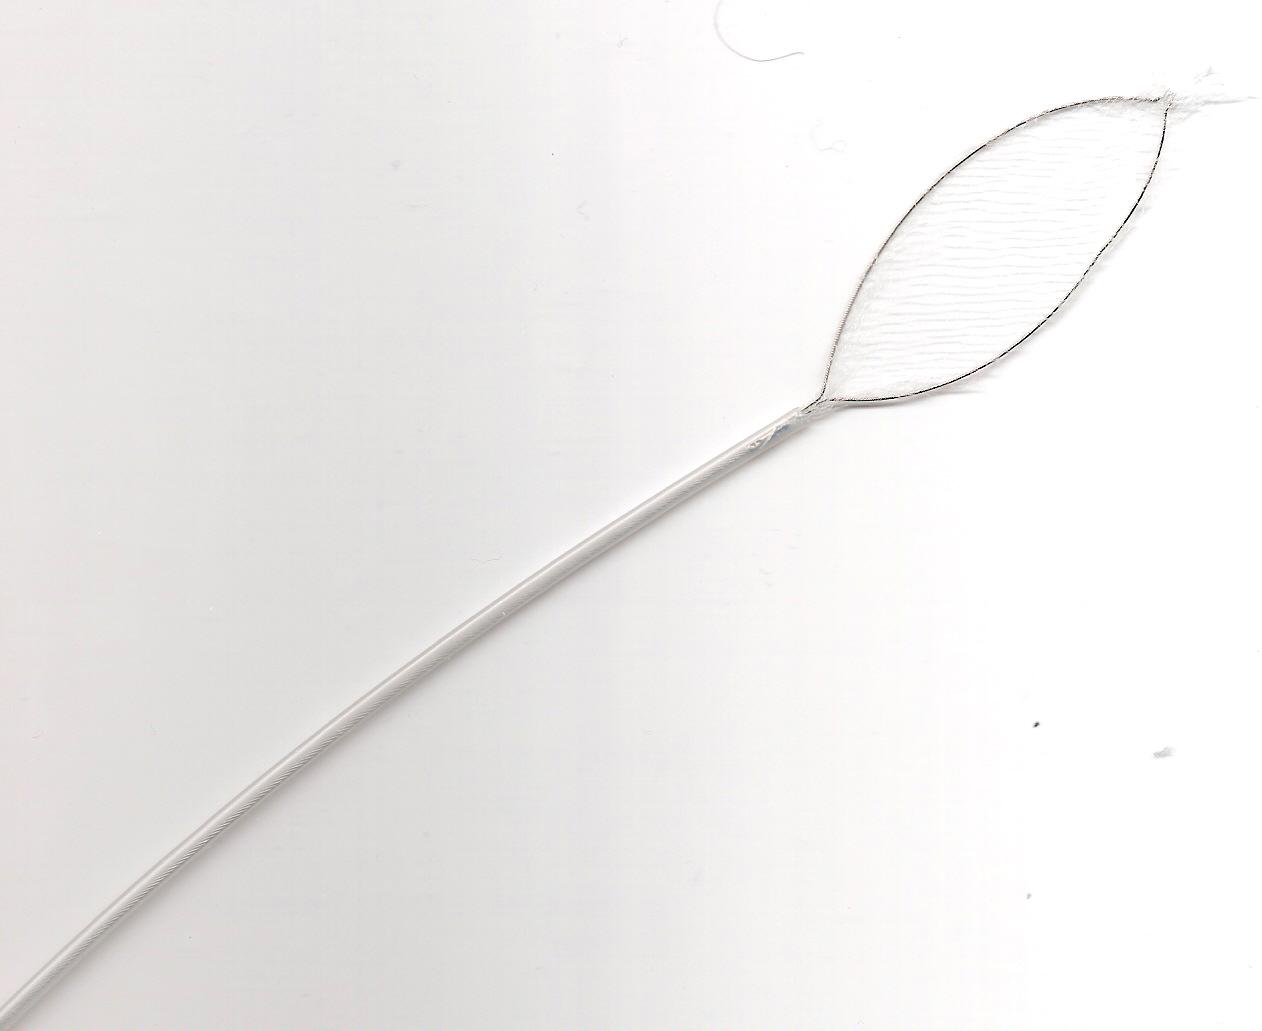 Prostate Biopsy Forceps Market in 360MarketUpdates.com